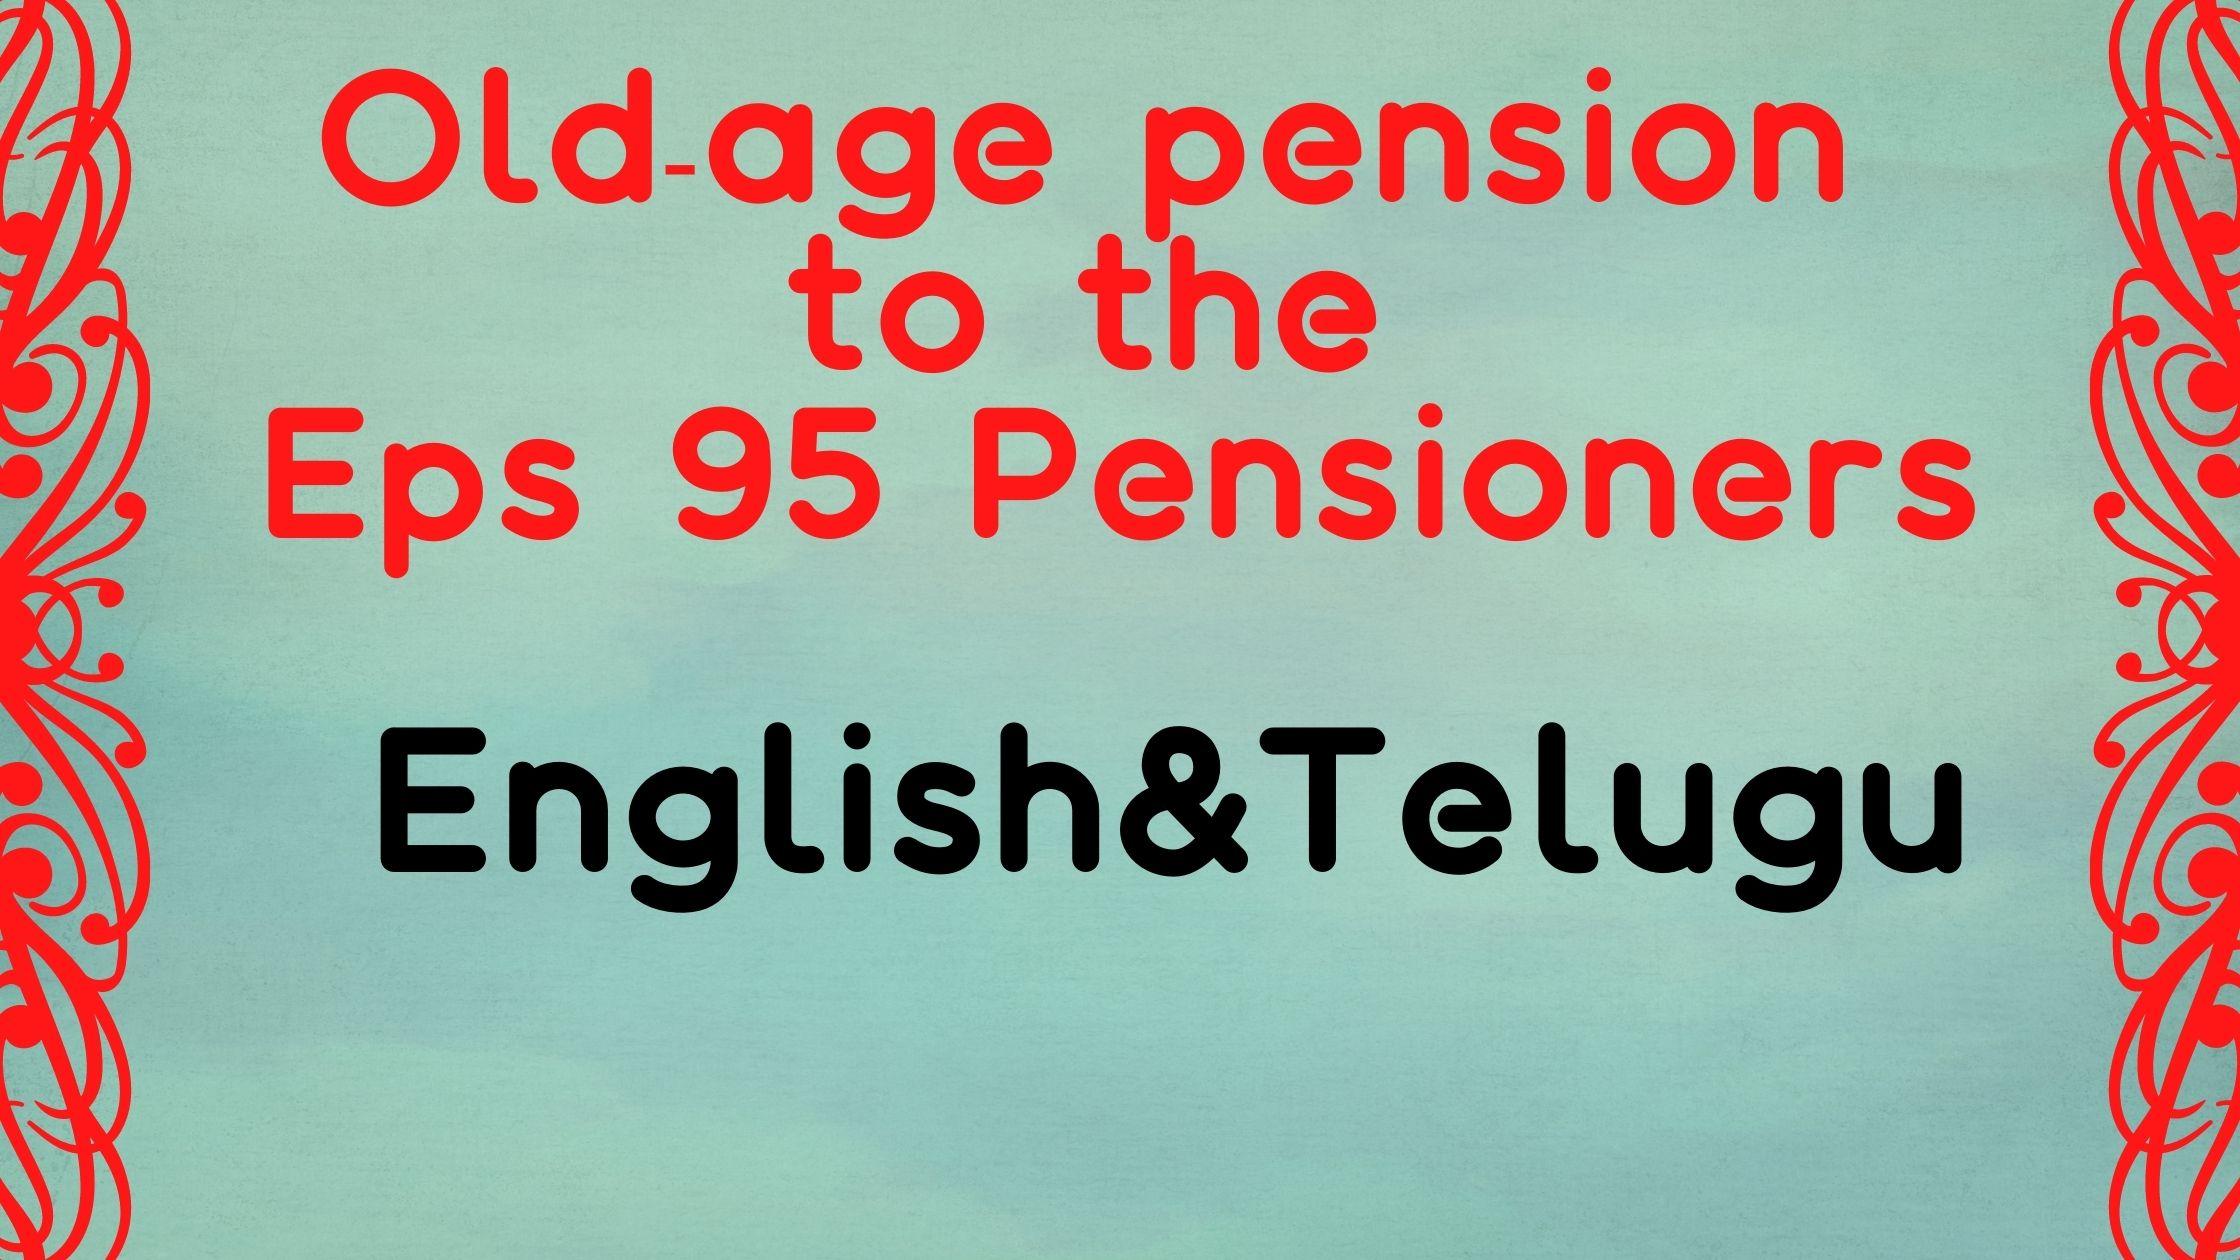 EPF 95 Pension Latest News